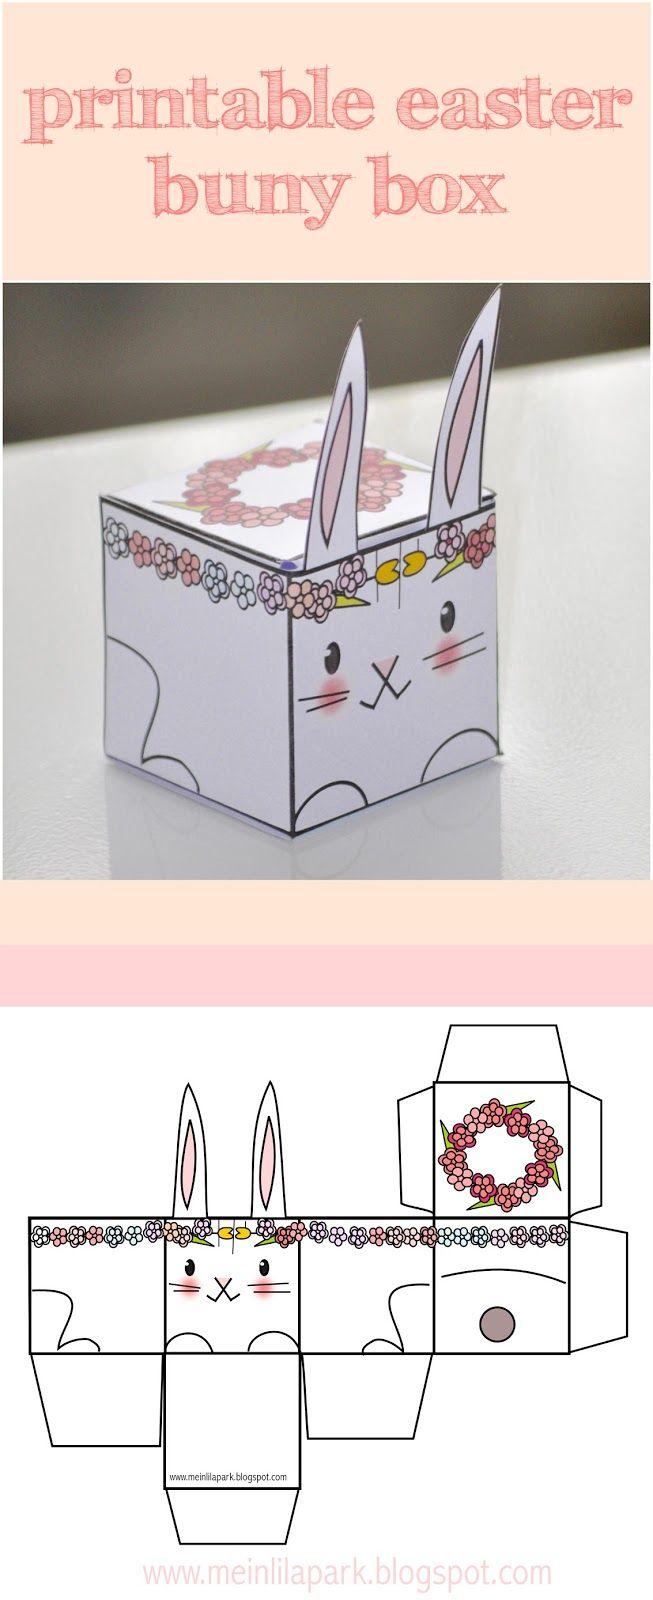 Free printable easter bunny box - ausdruckbare DIY Box - freebie ...